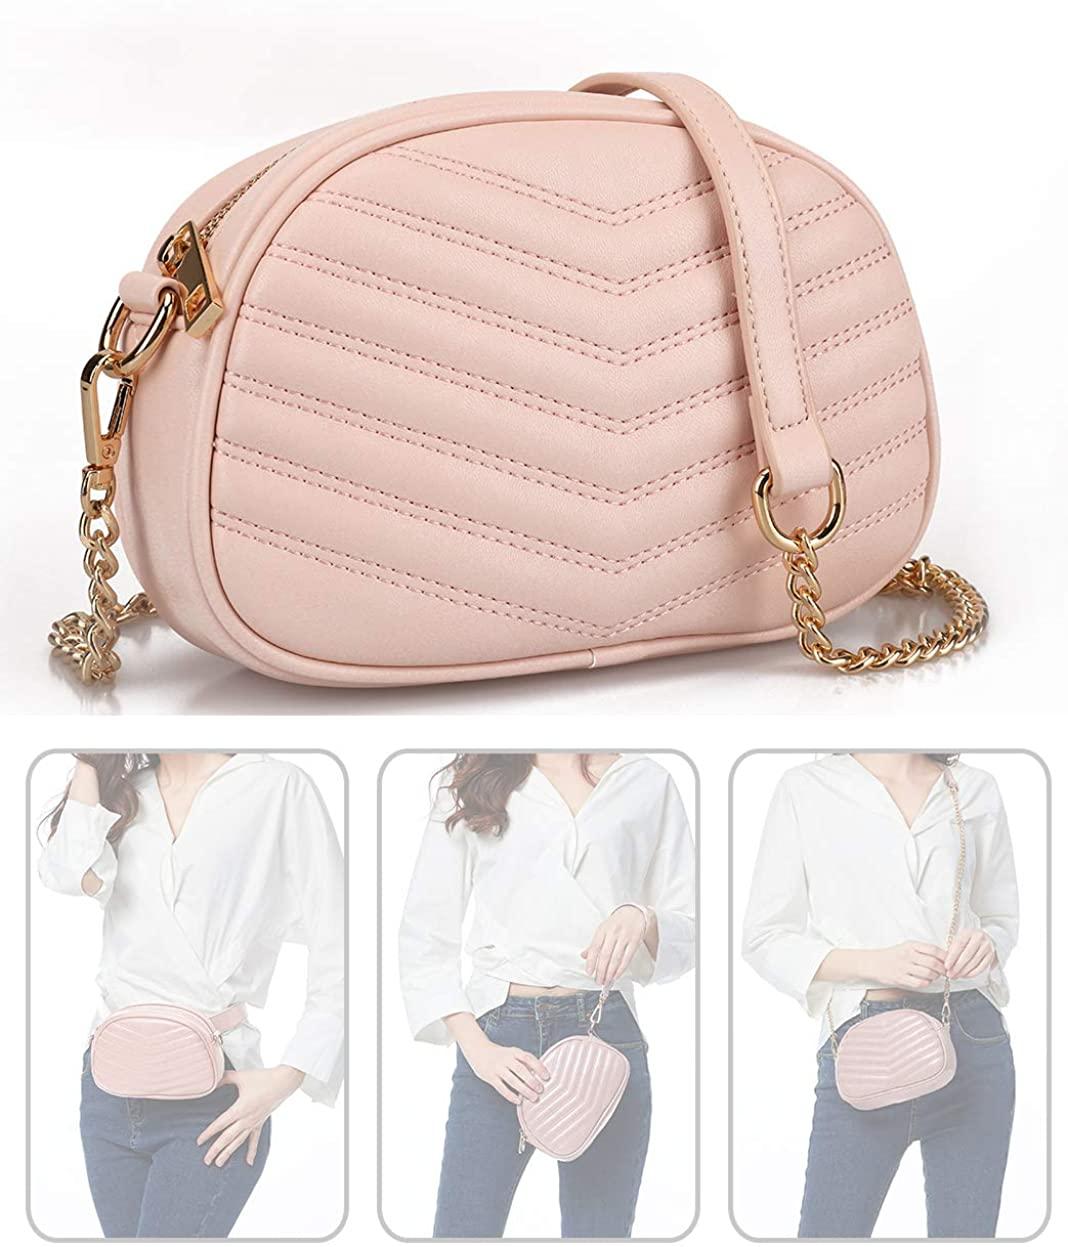 Fashion Waist Bags for Women Adjustable Waterproof Crossbody Satchel Bag Bumbag